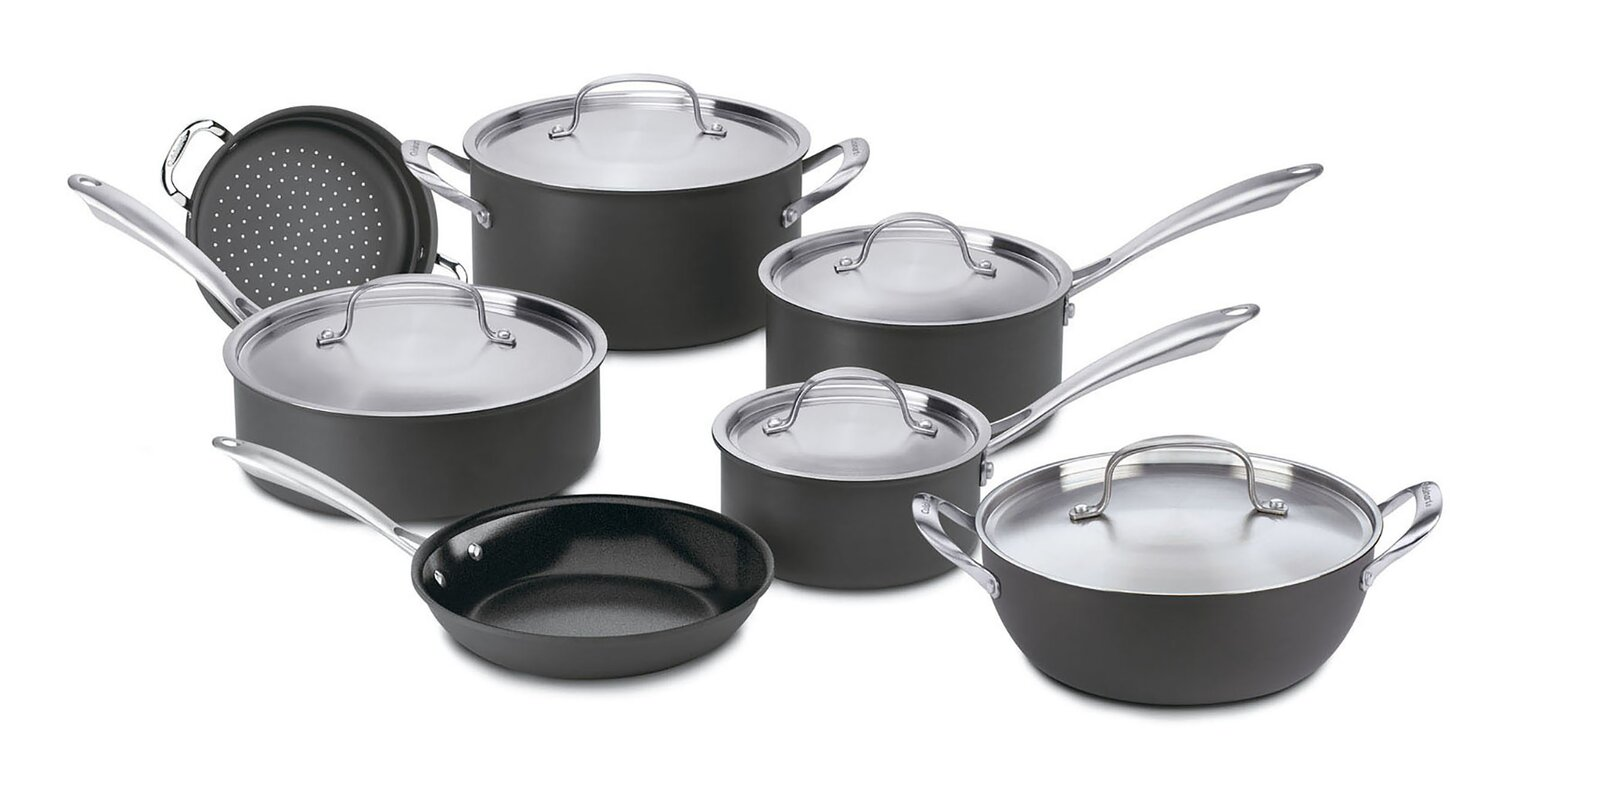 Cuisinart Cuisinart 12 Piece Hard-Anodized Aluminum Non Stick Cookware Set